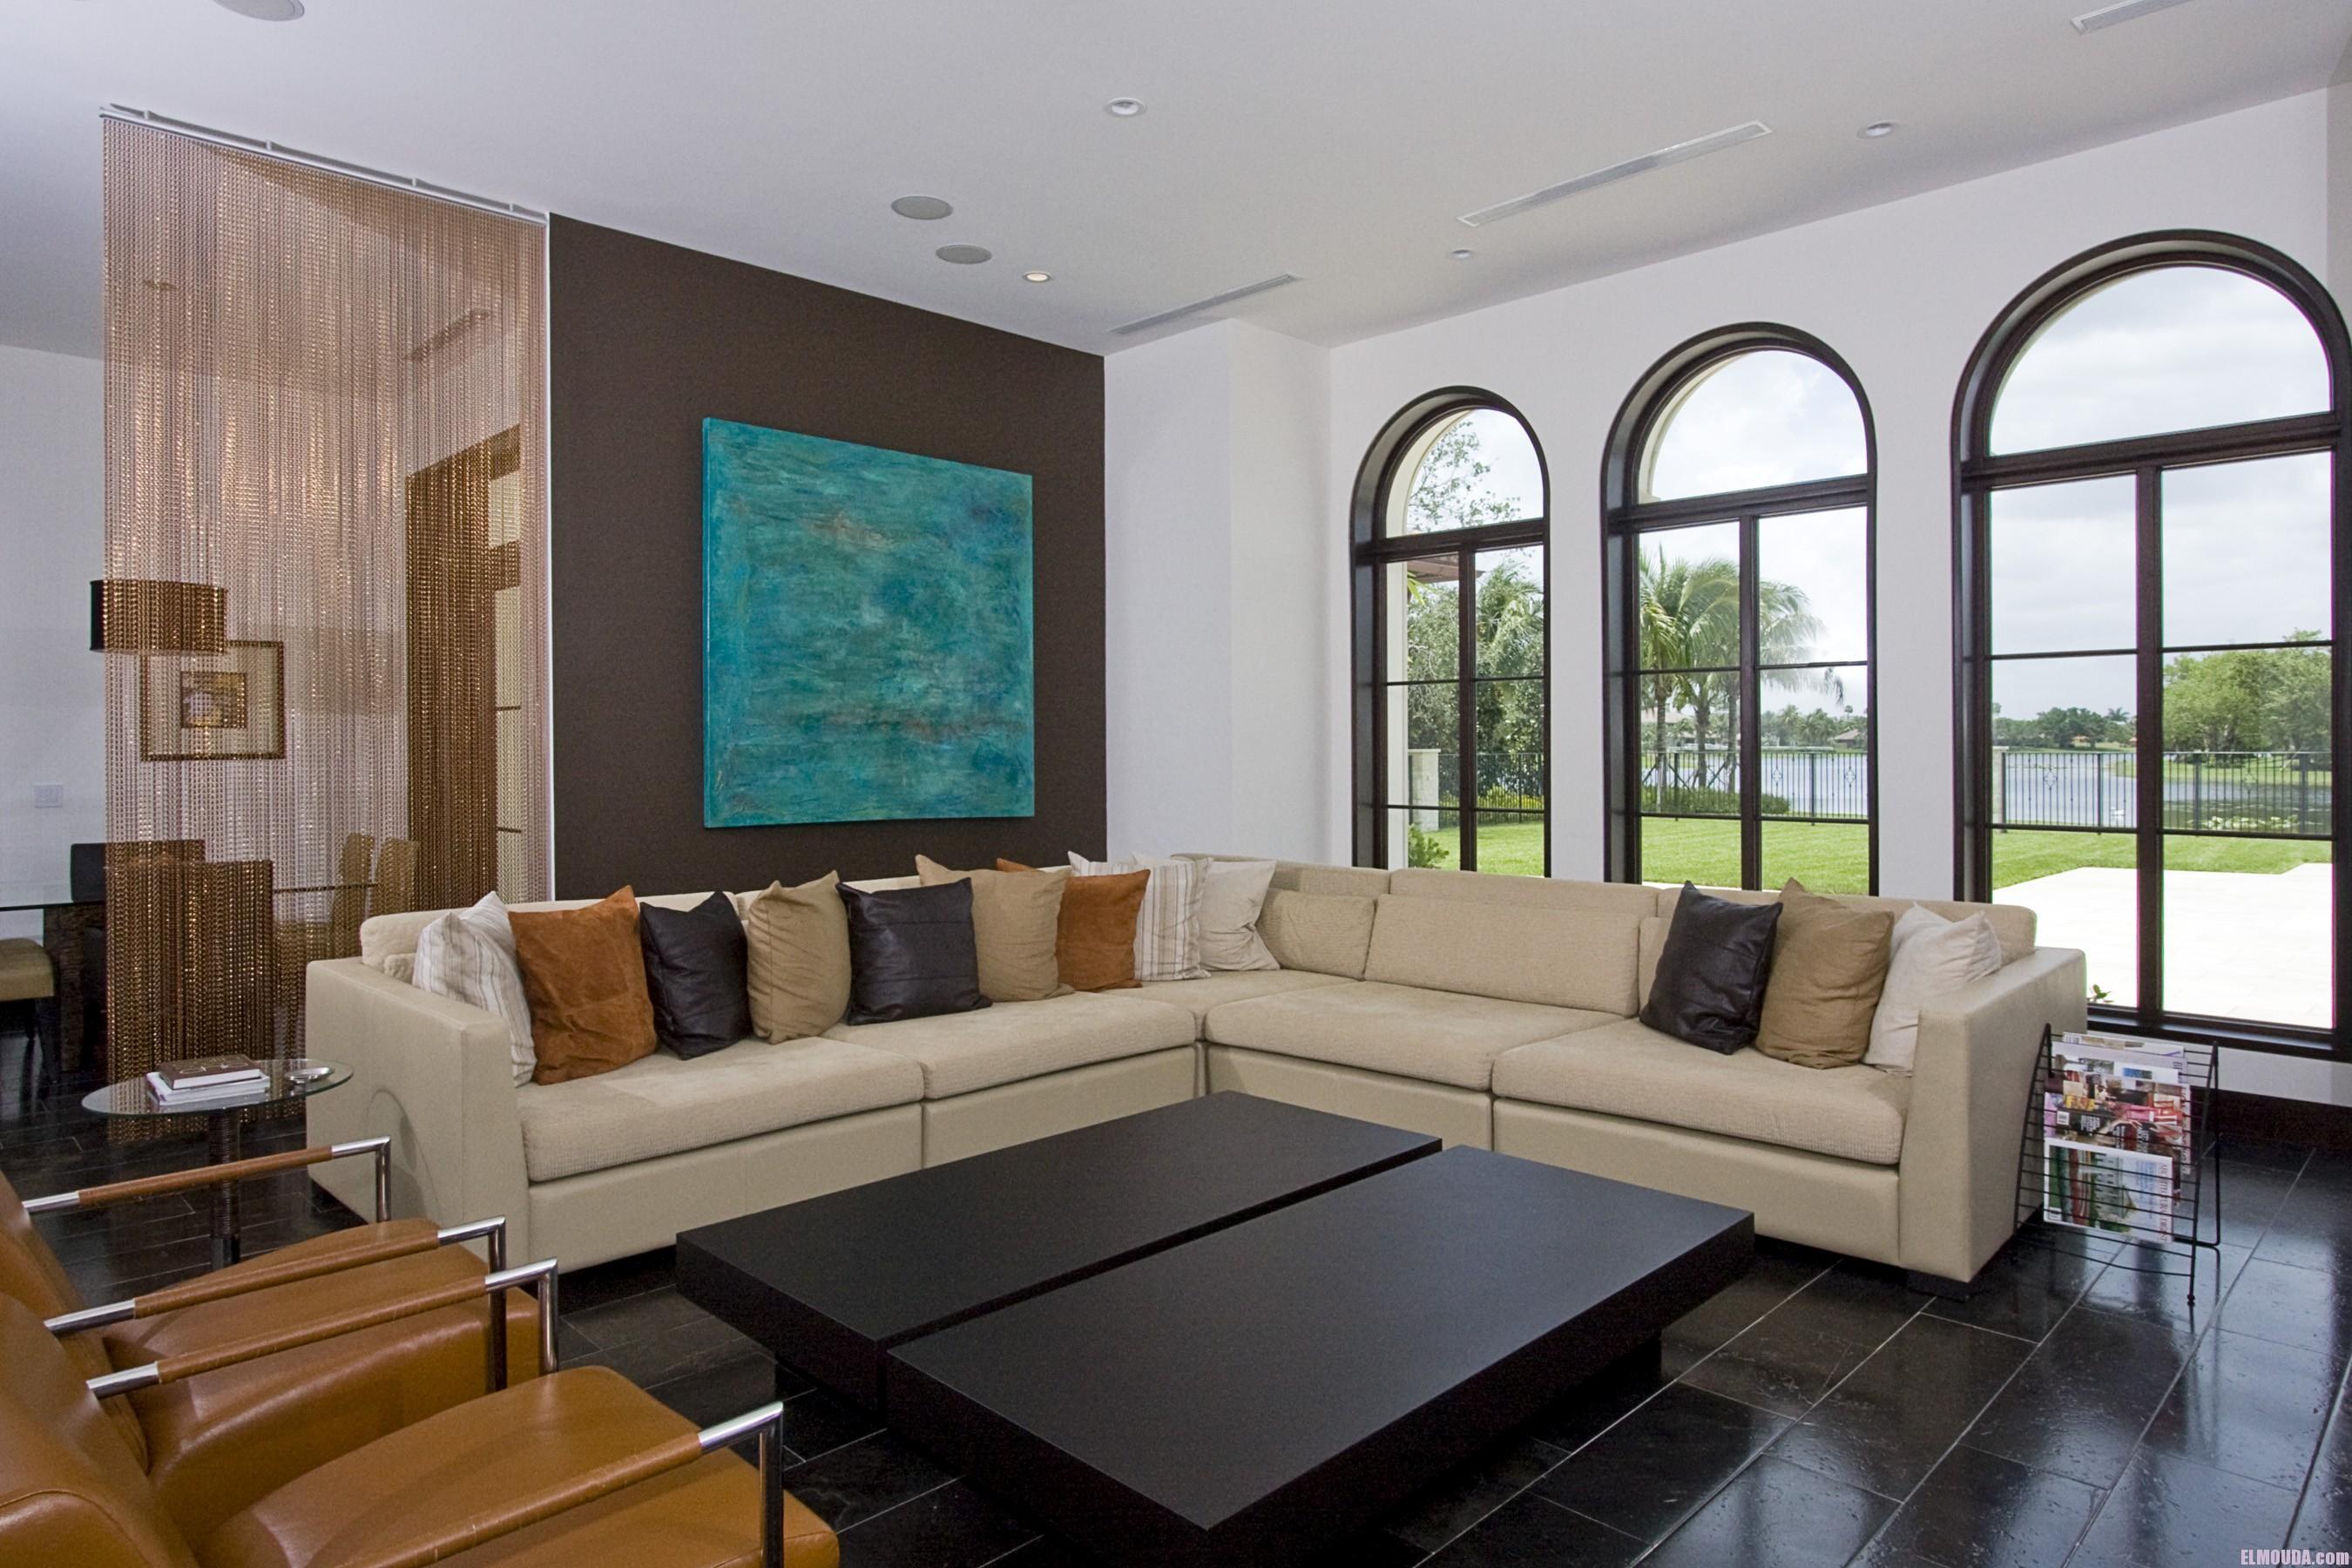 Modern Living Room Home Decorating Ideas: غرف جلوس مودرن بالصور ديكورات وتصاميم لغرفة الجلوس